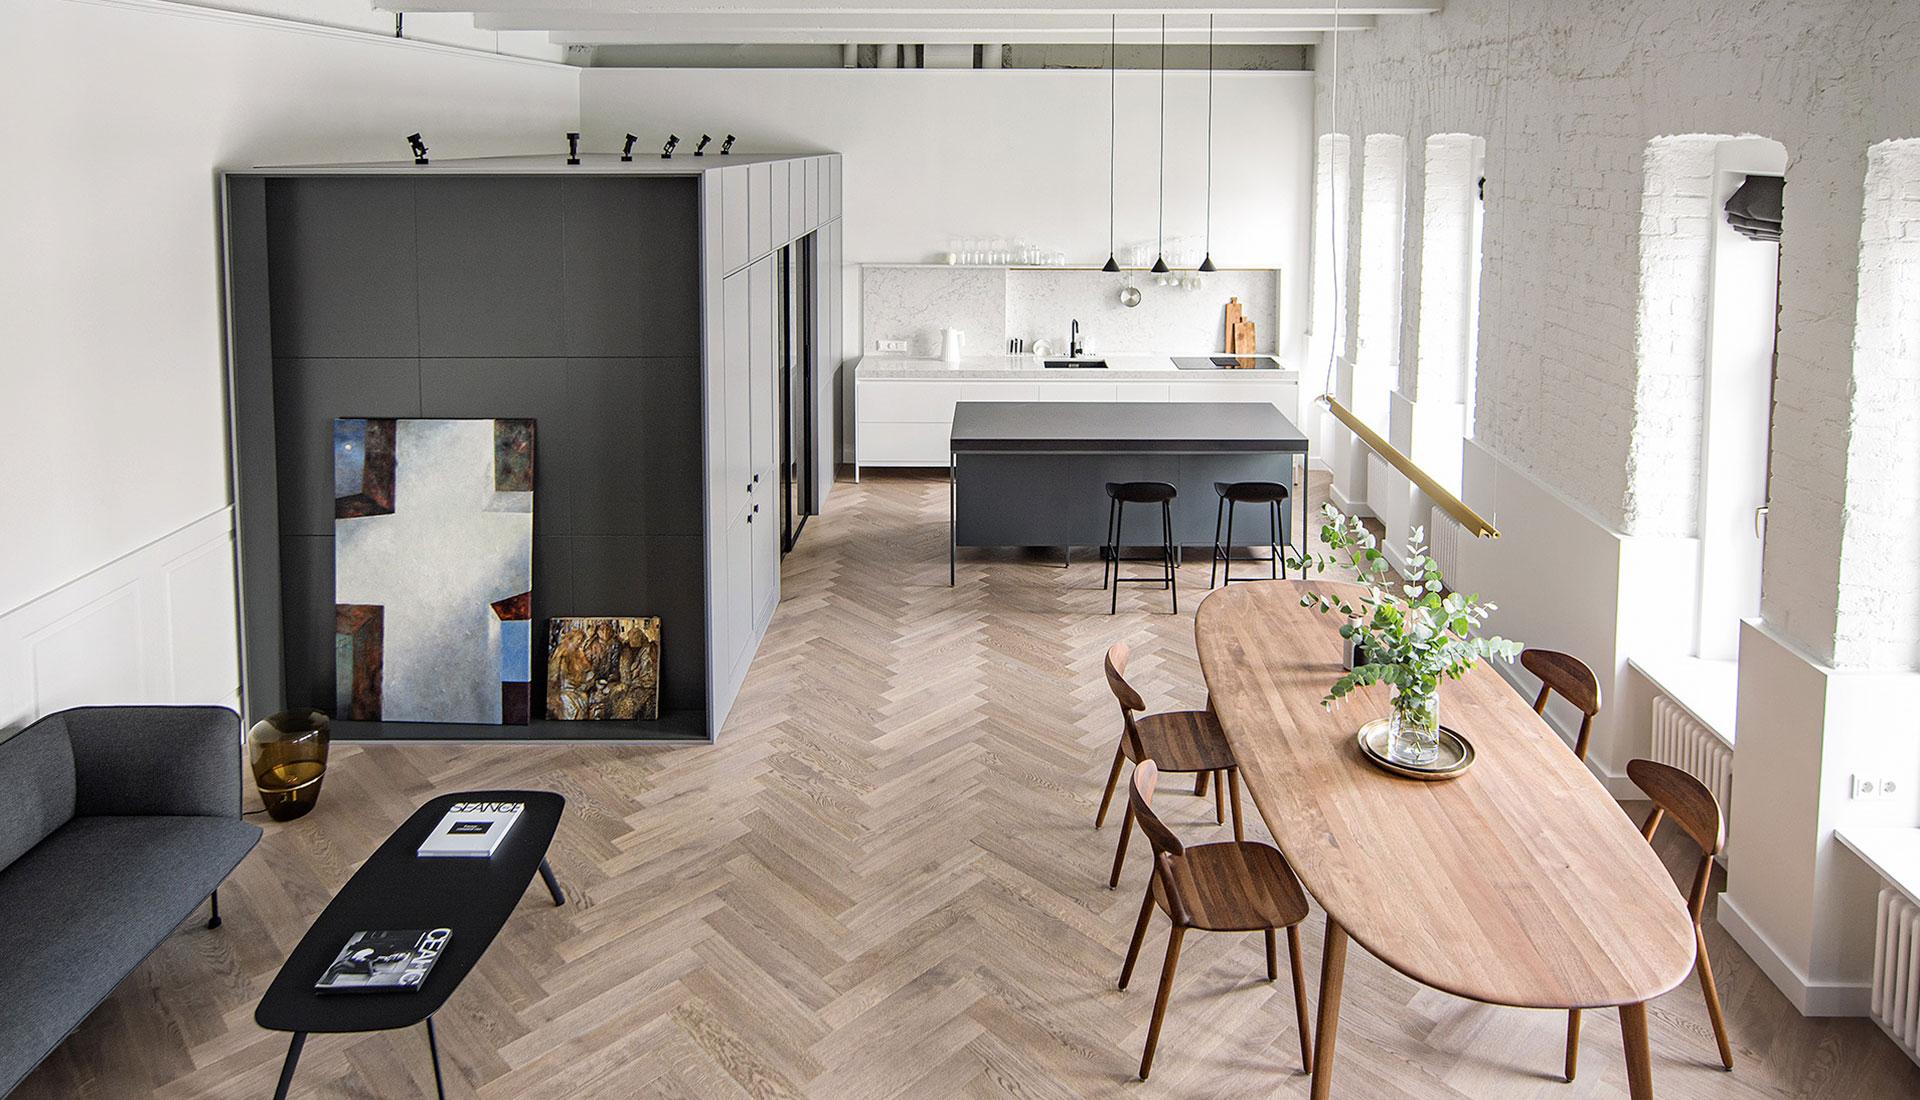 Проект INT2architecture: квартира в московском особняке